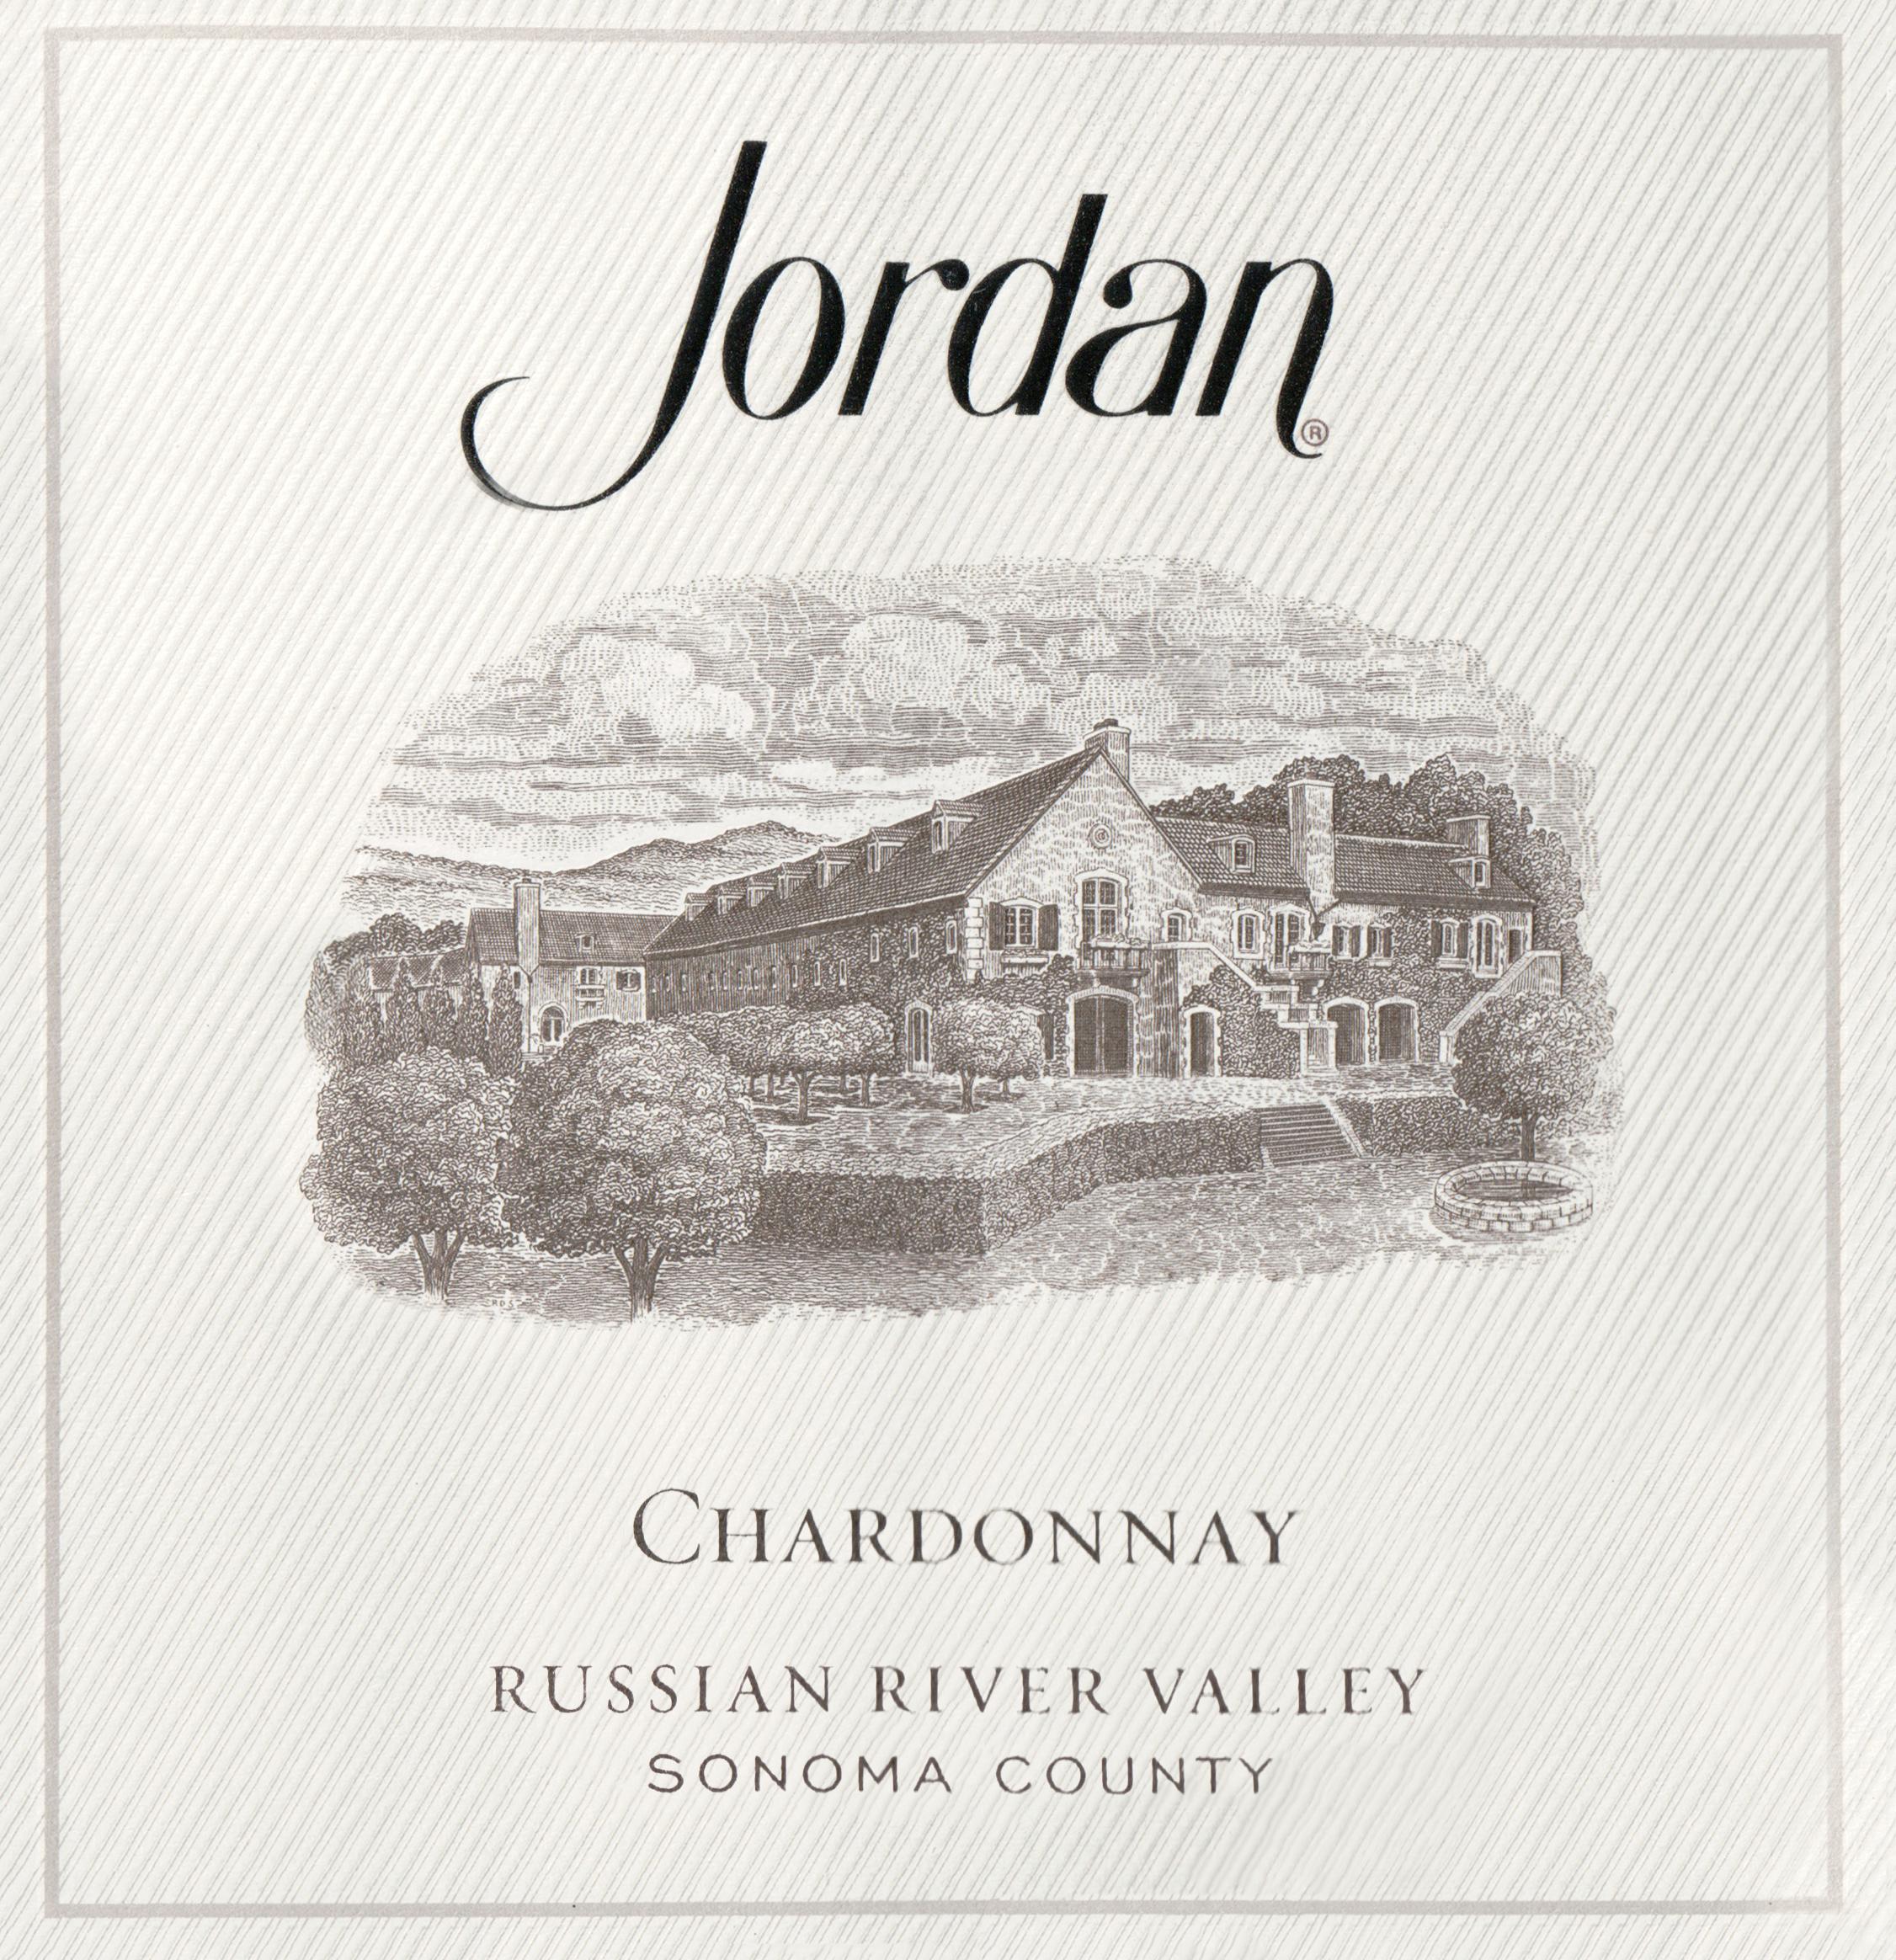 Jordan Vineyard Chardonnay 2018